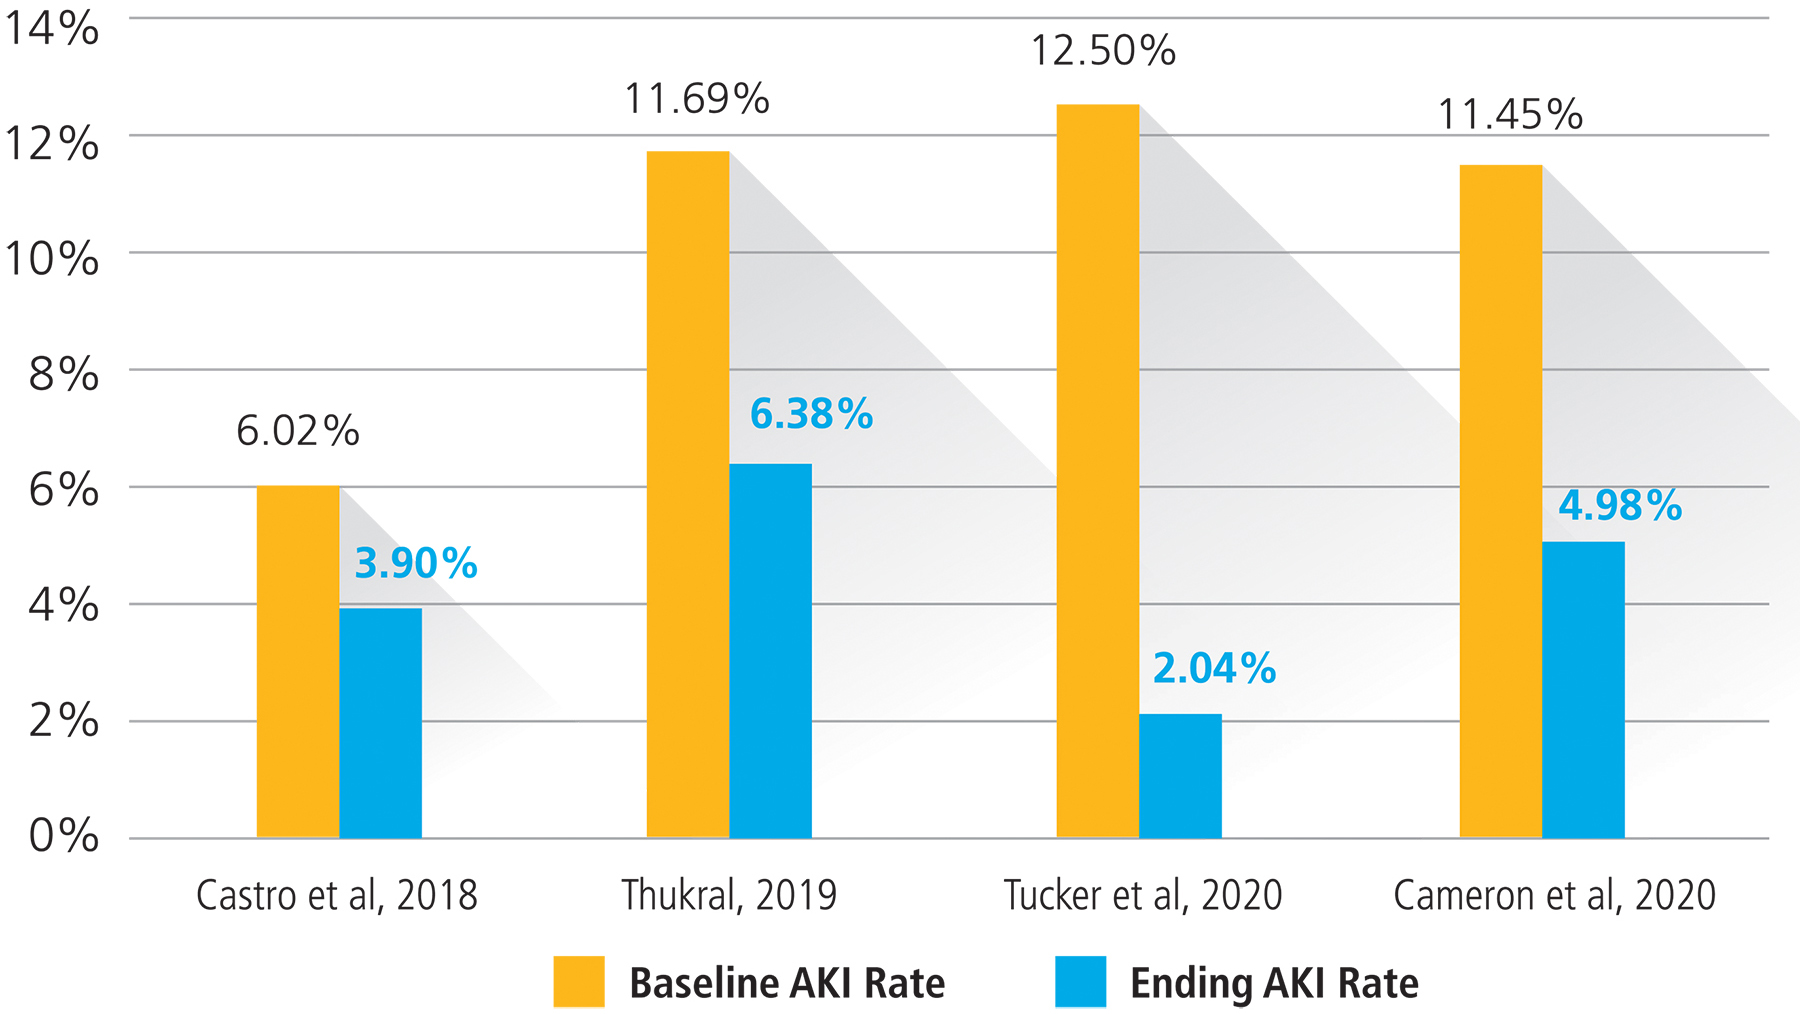 QI Programs AKI Reduction